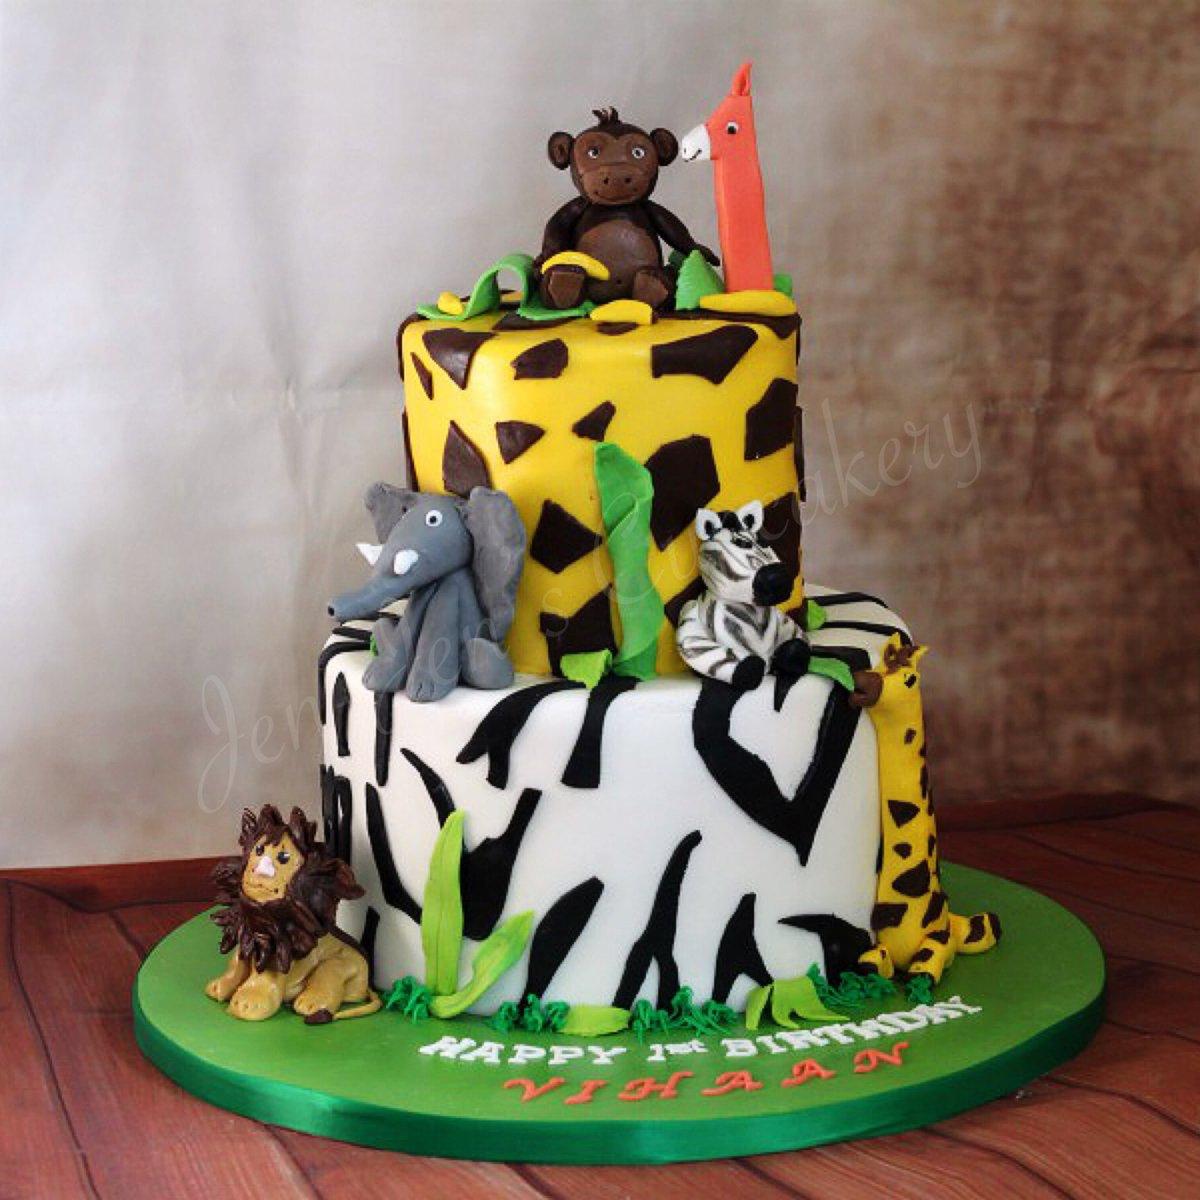 JenJensCupcakery On Twitter Jungle Themed 1st Birthday Cake